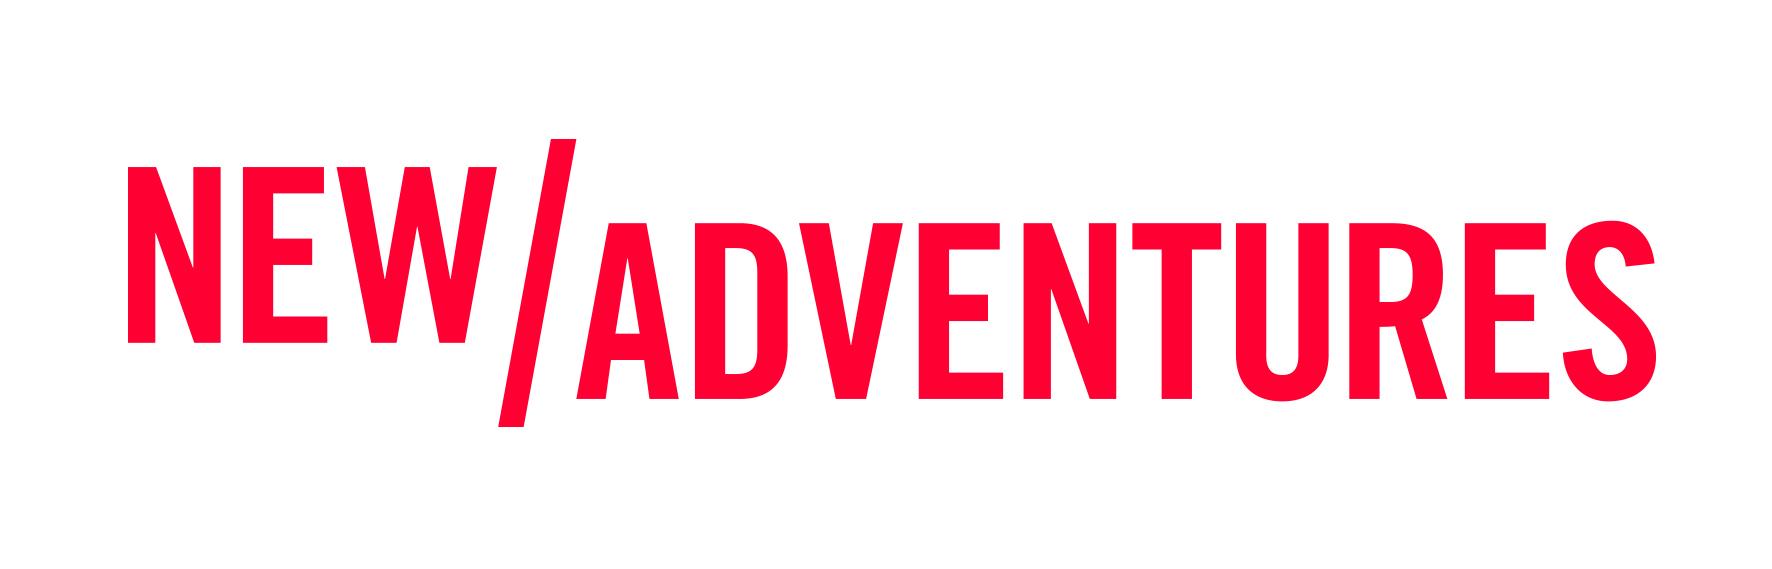 New_Adventures_Red.jpg